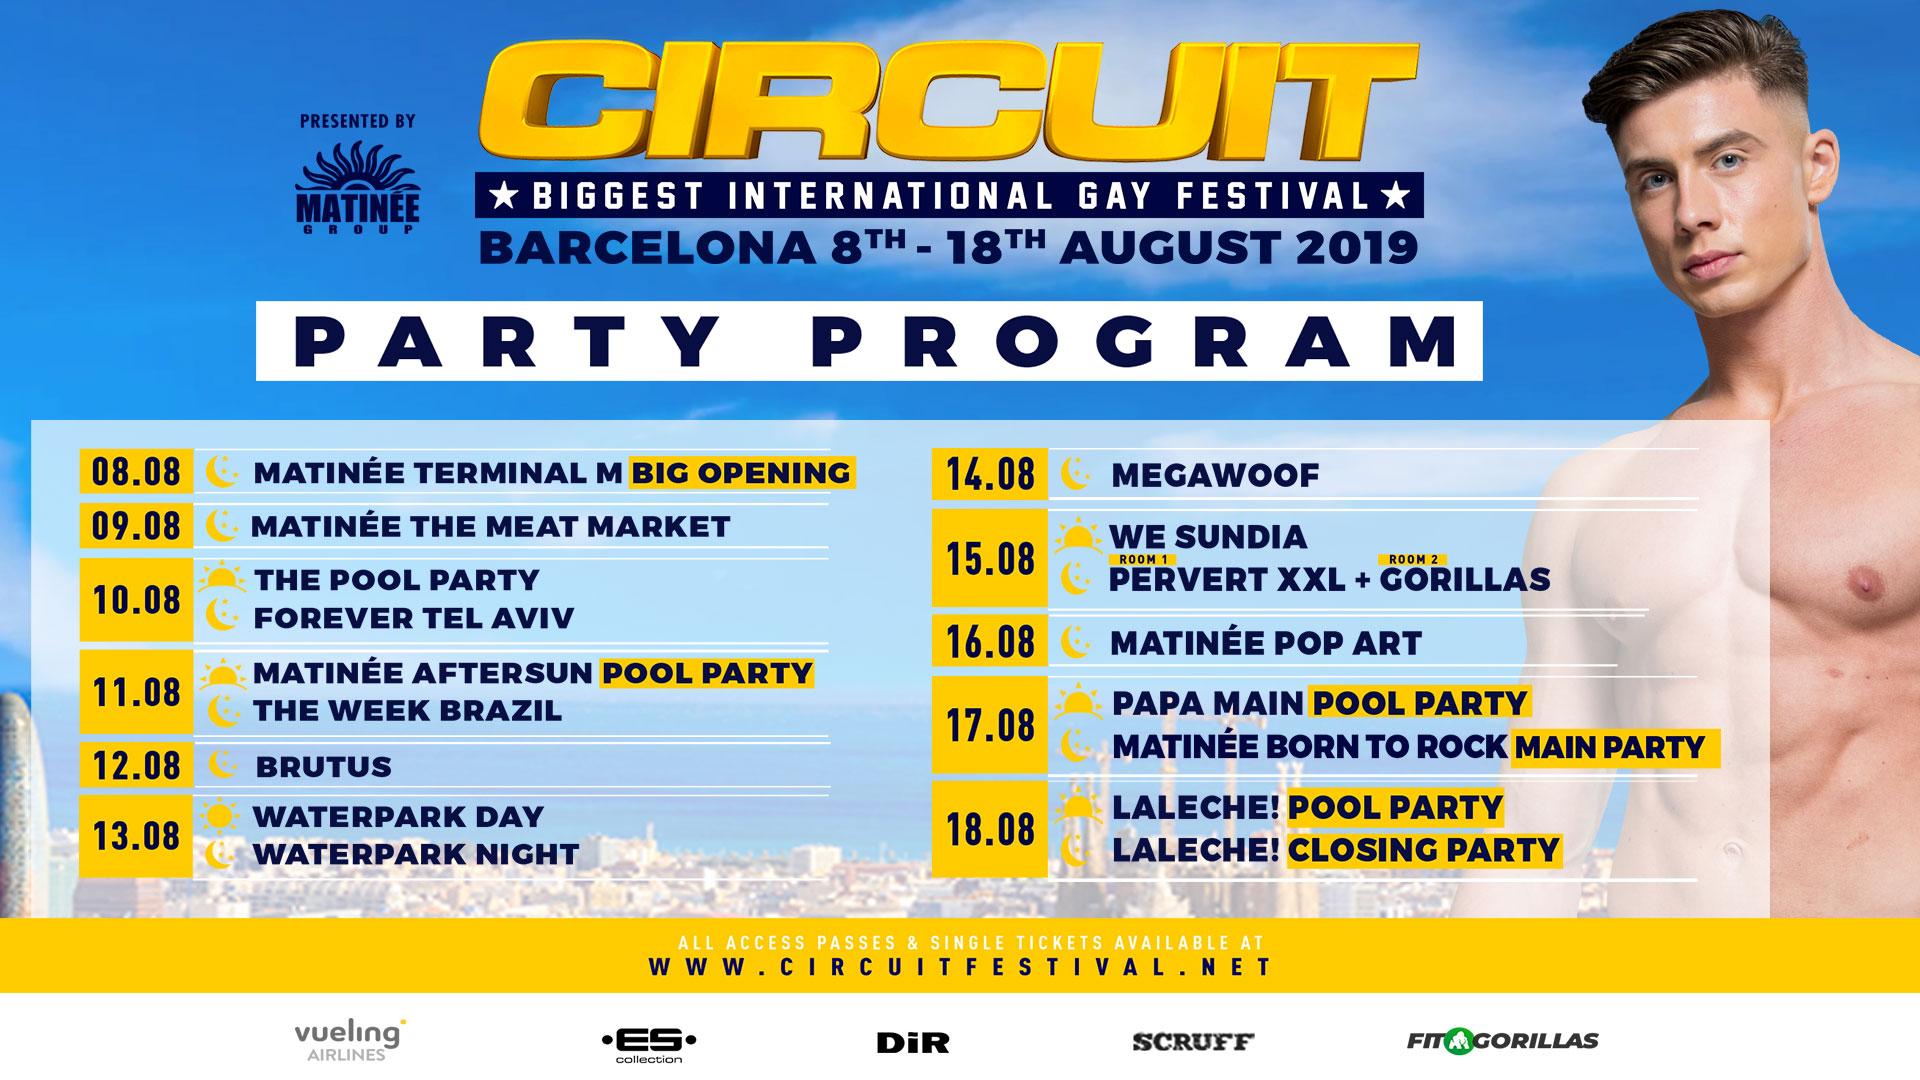 Party_program_2019